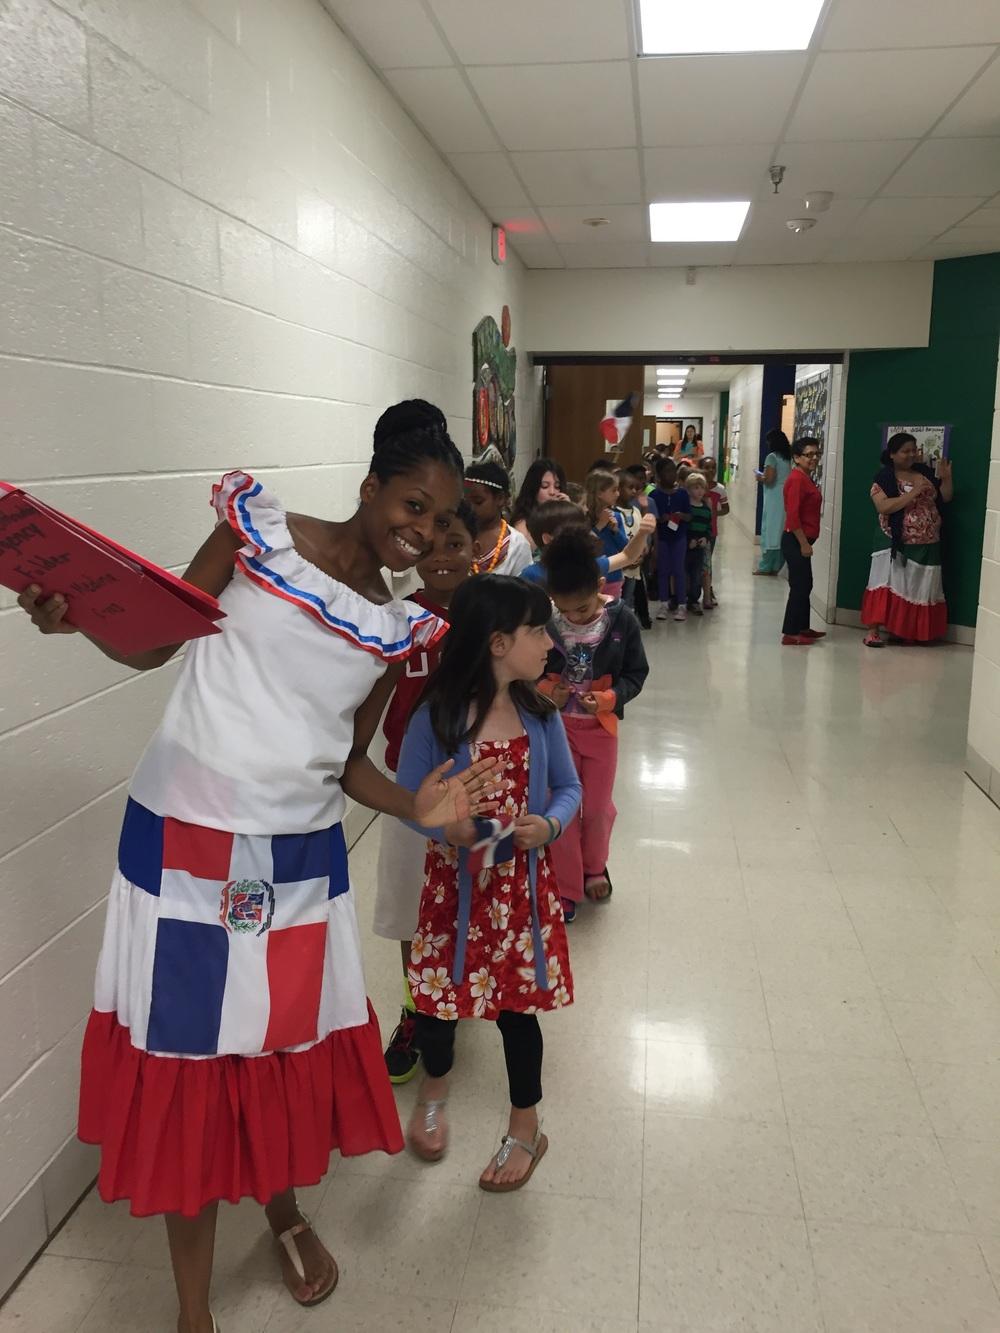 Srta. Medina and her class parading through the school.